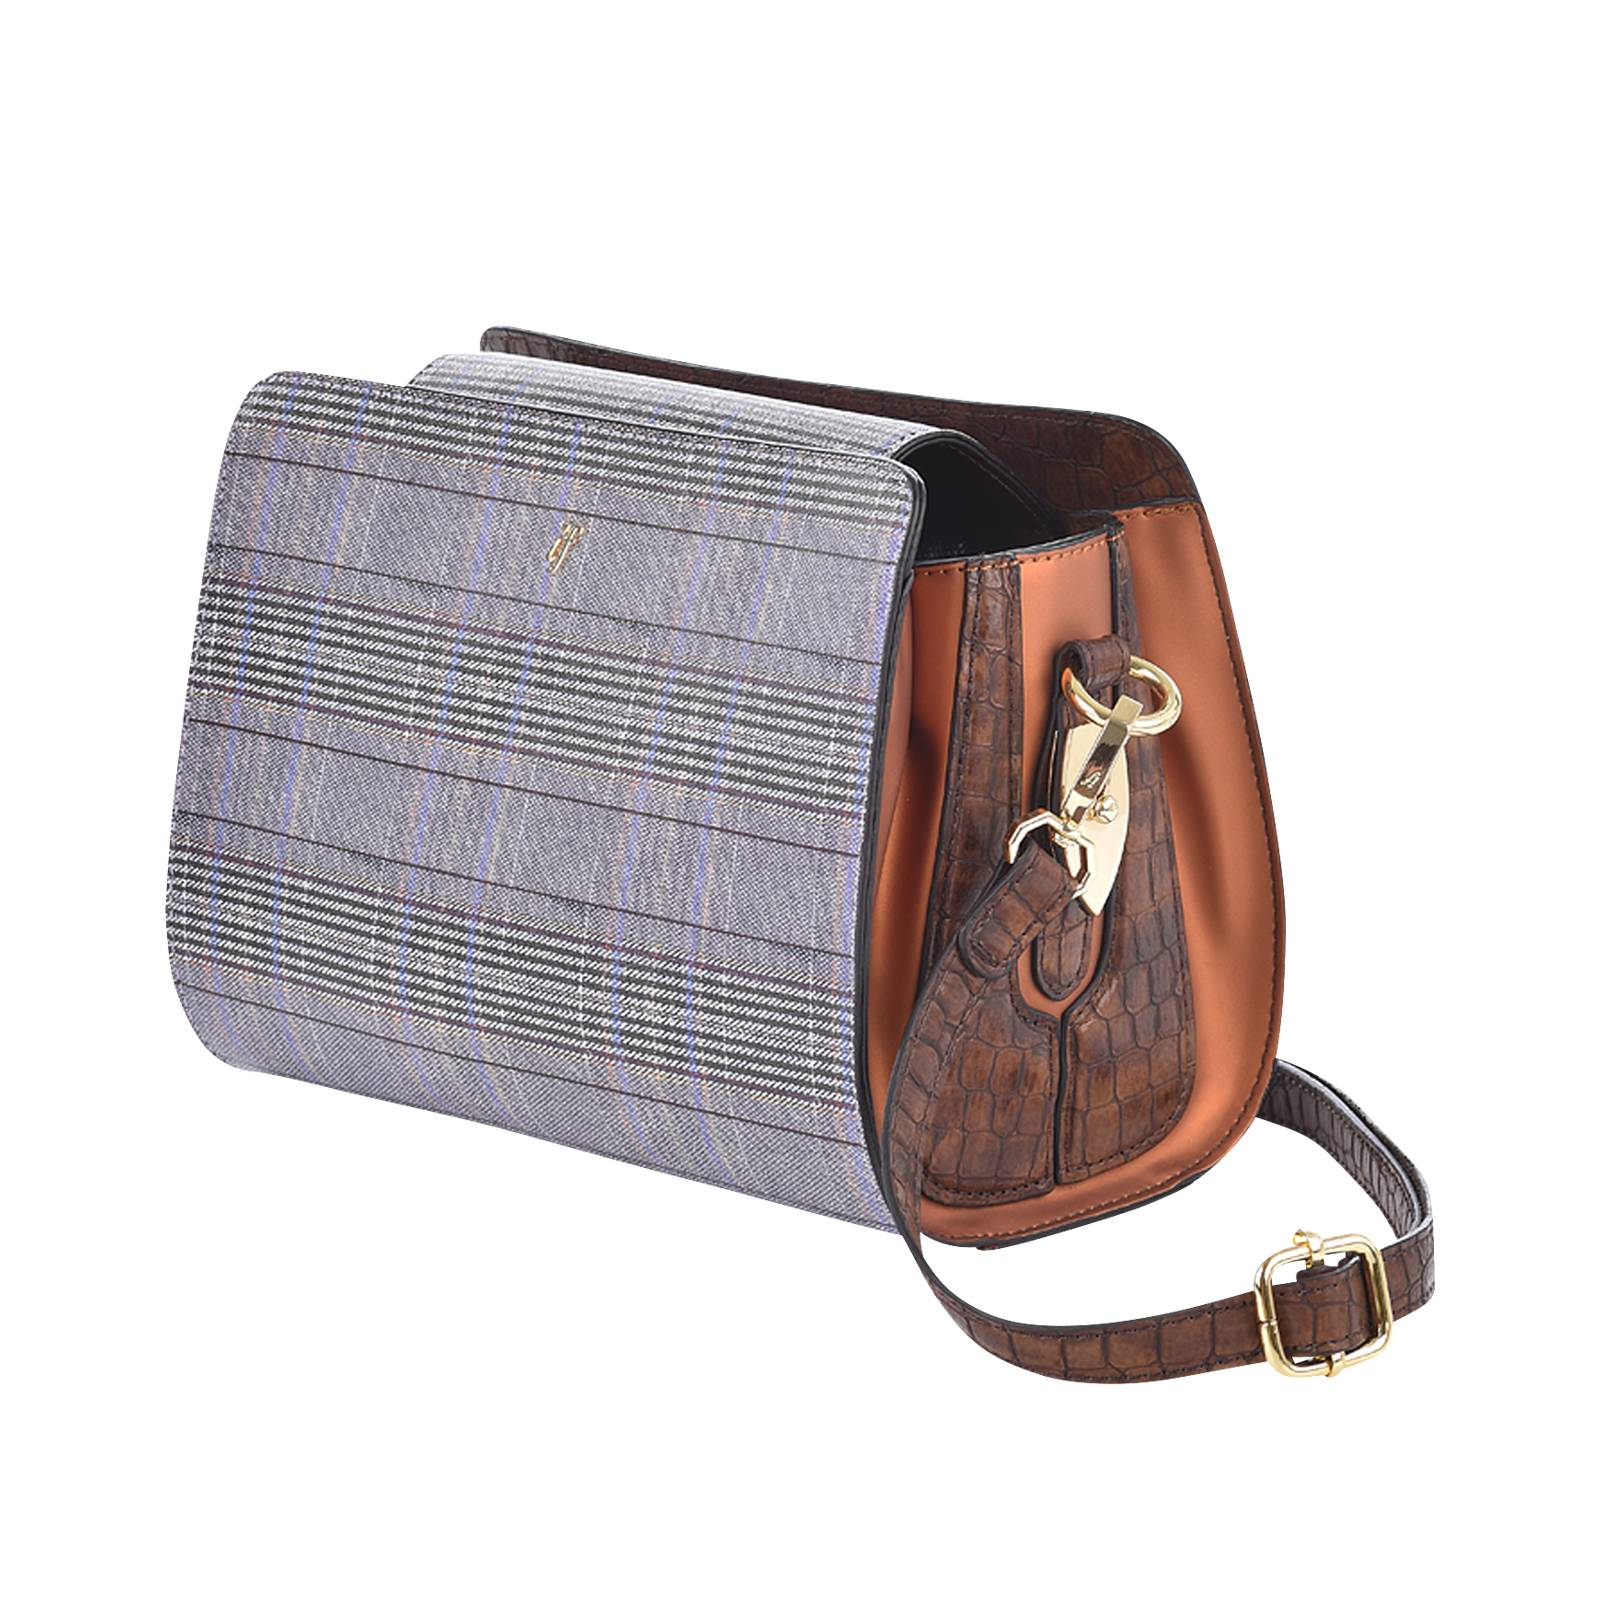 Wales Check - Γυναικεία τσάντα If από δερμα συνθετικο και δερμα ... 0a55aec6882